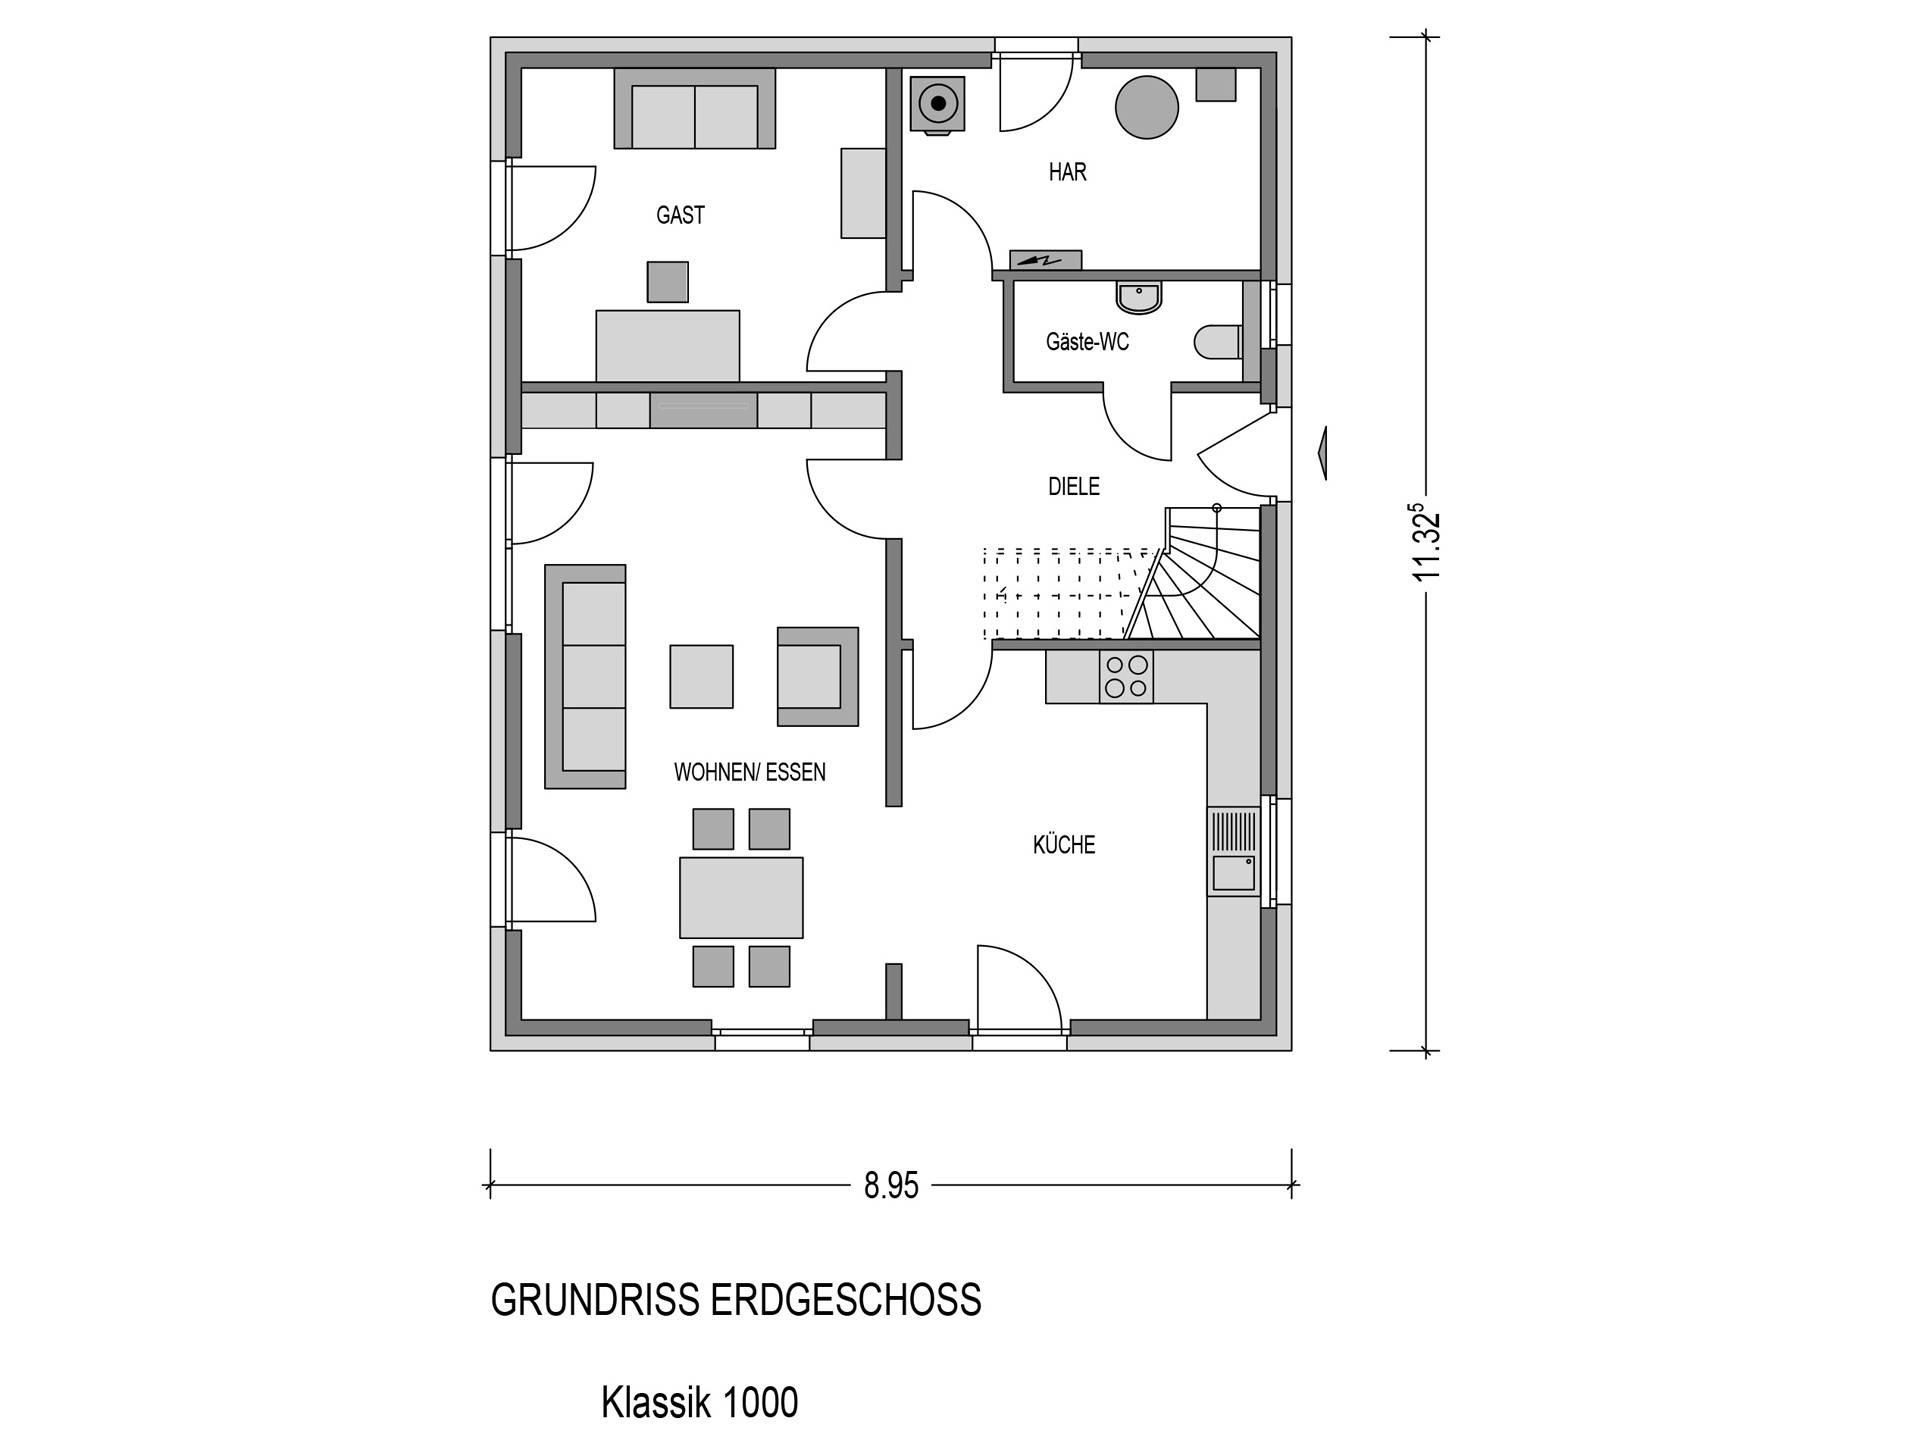 Bauidee Einfamilienhaus Klassik 1000.2 Grundriss